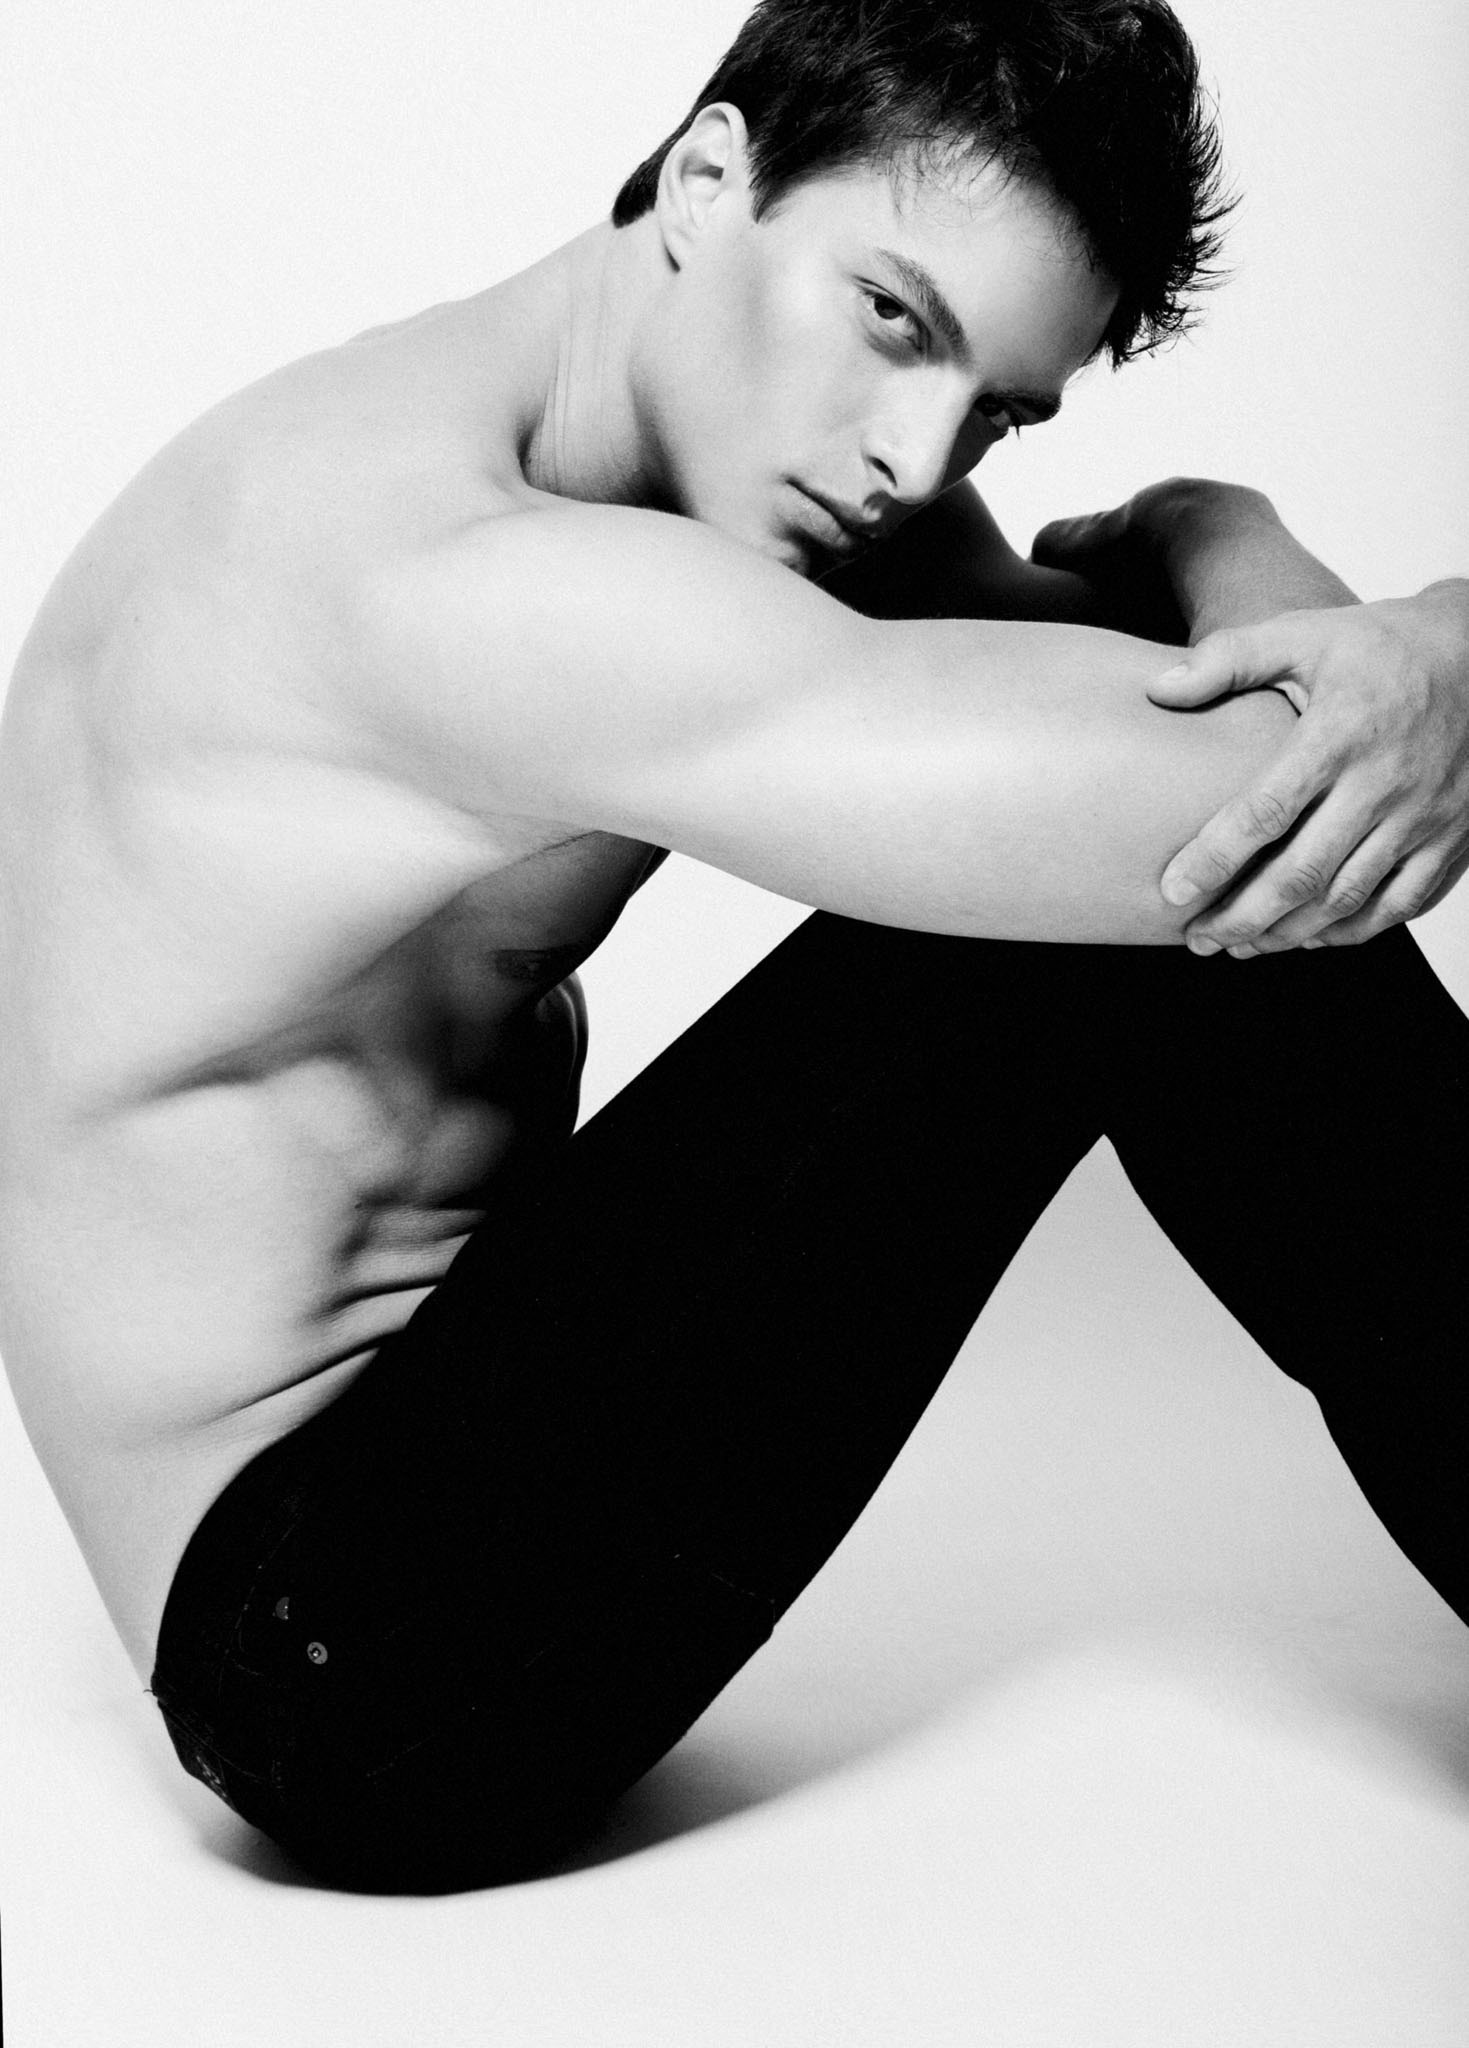 nyc-photographers-male-model-test-10026.jpg